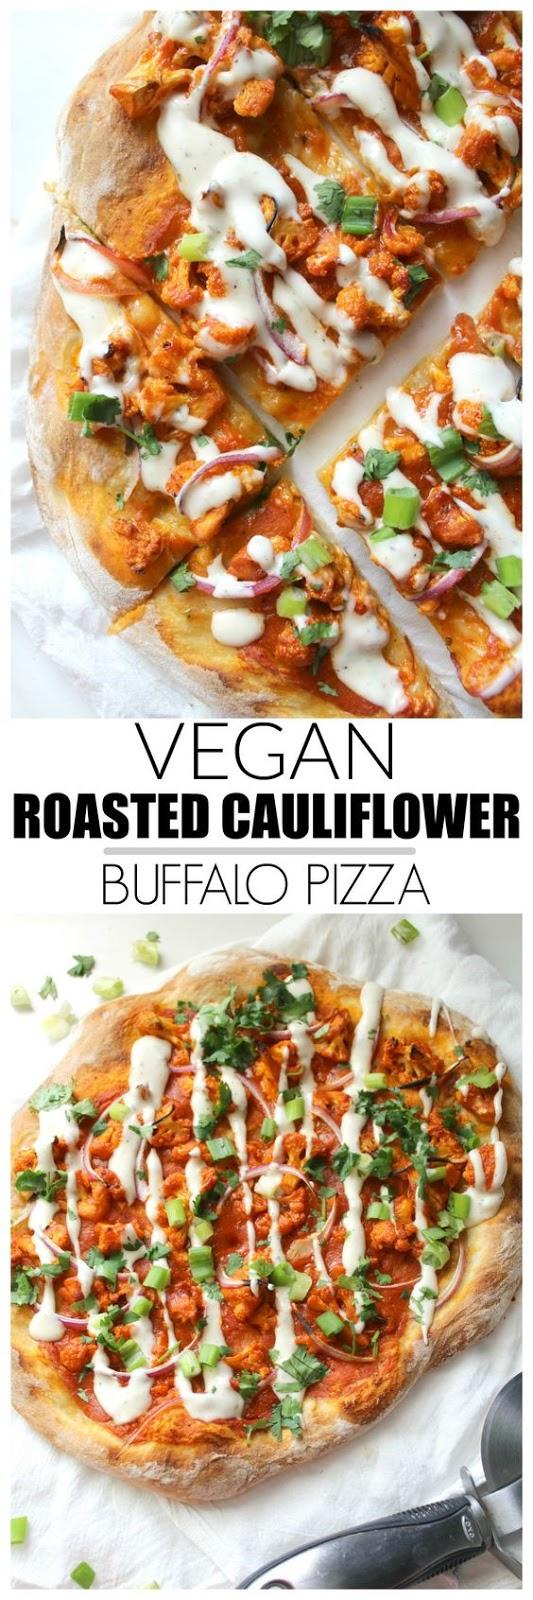 VEGAN ROASTED CAULIFLOWER BUFFALO PIZZA